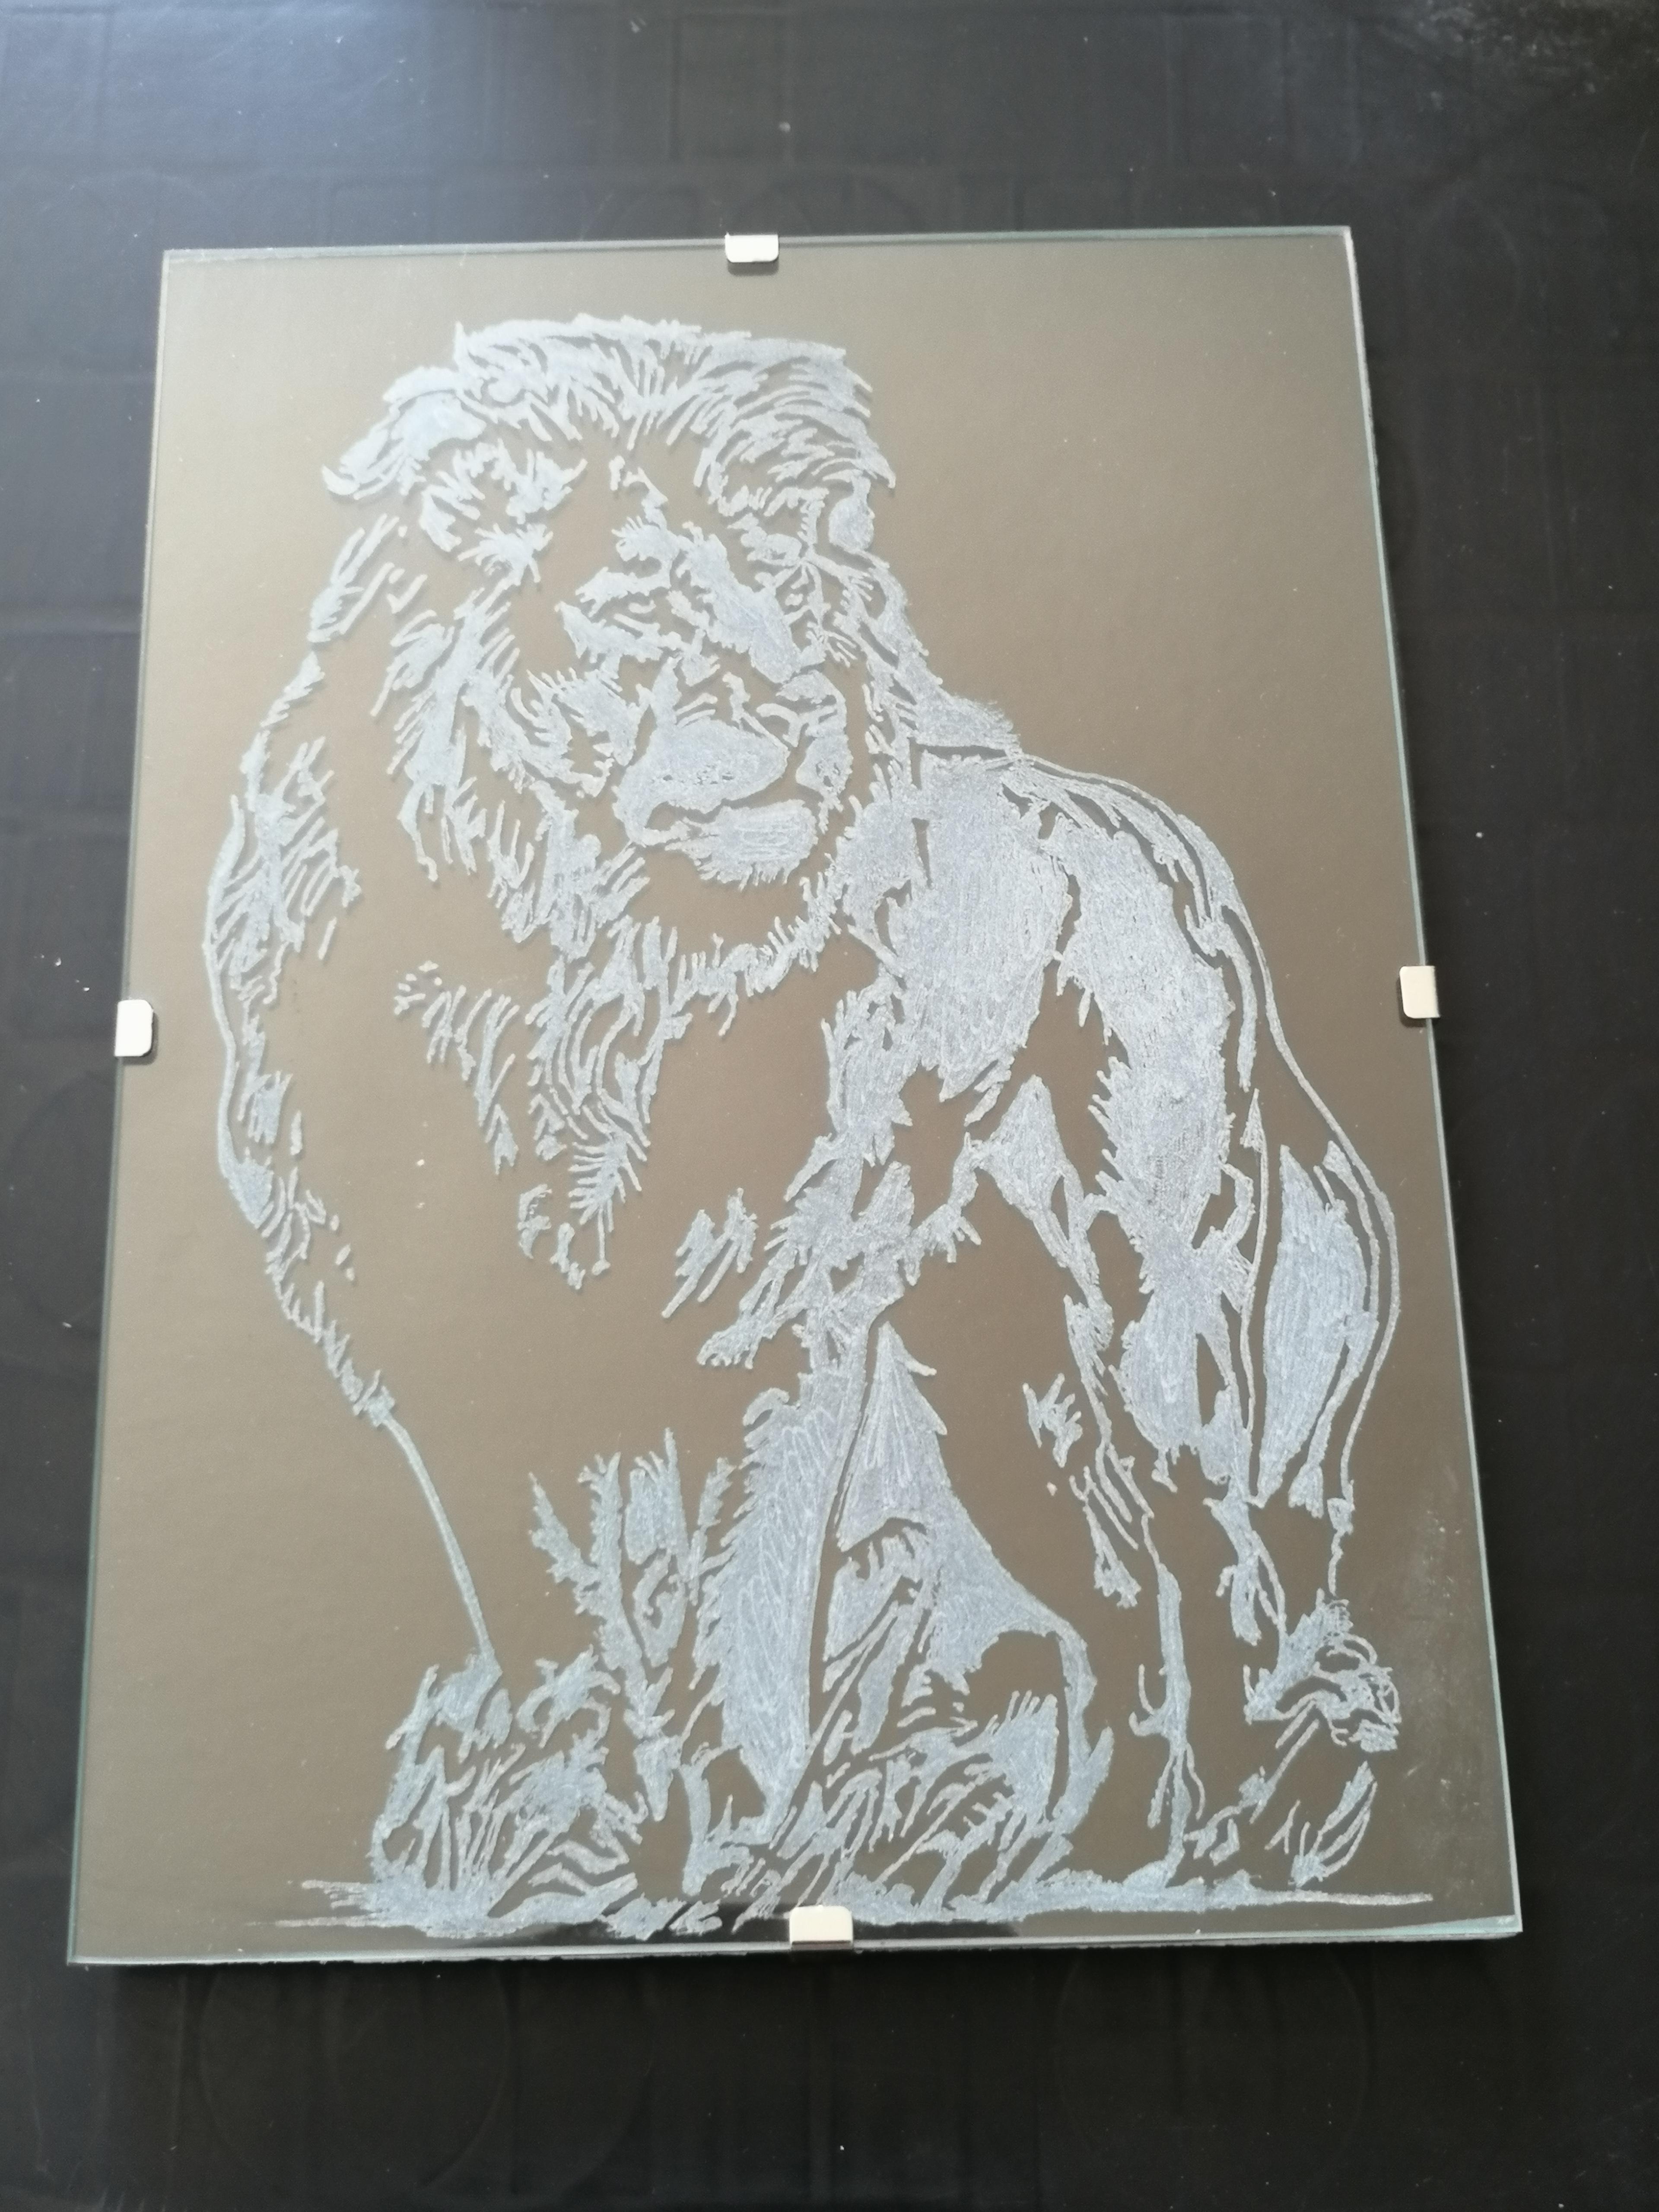 Galerie d'image - mtgravure